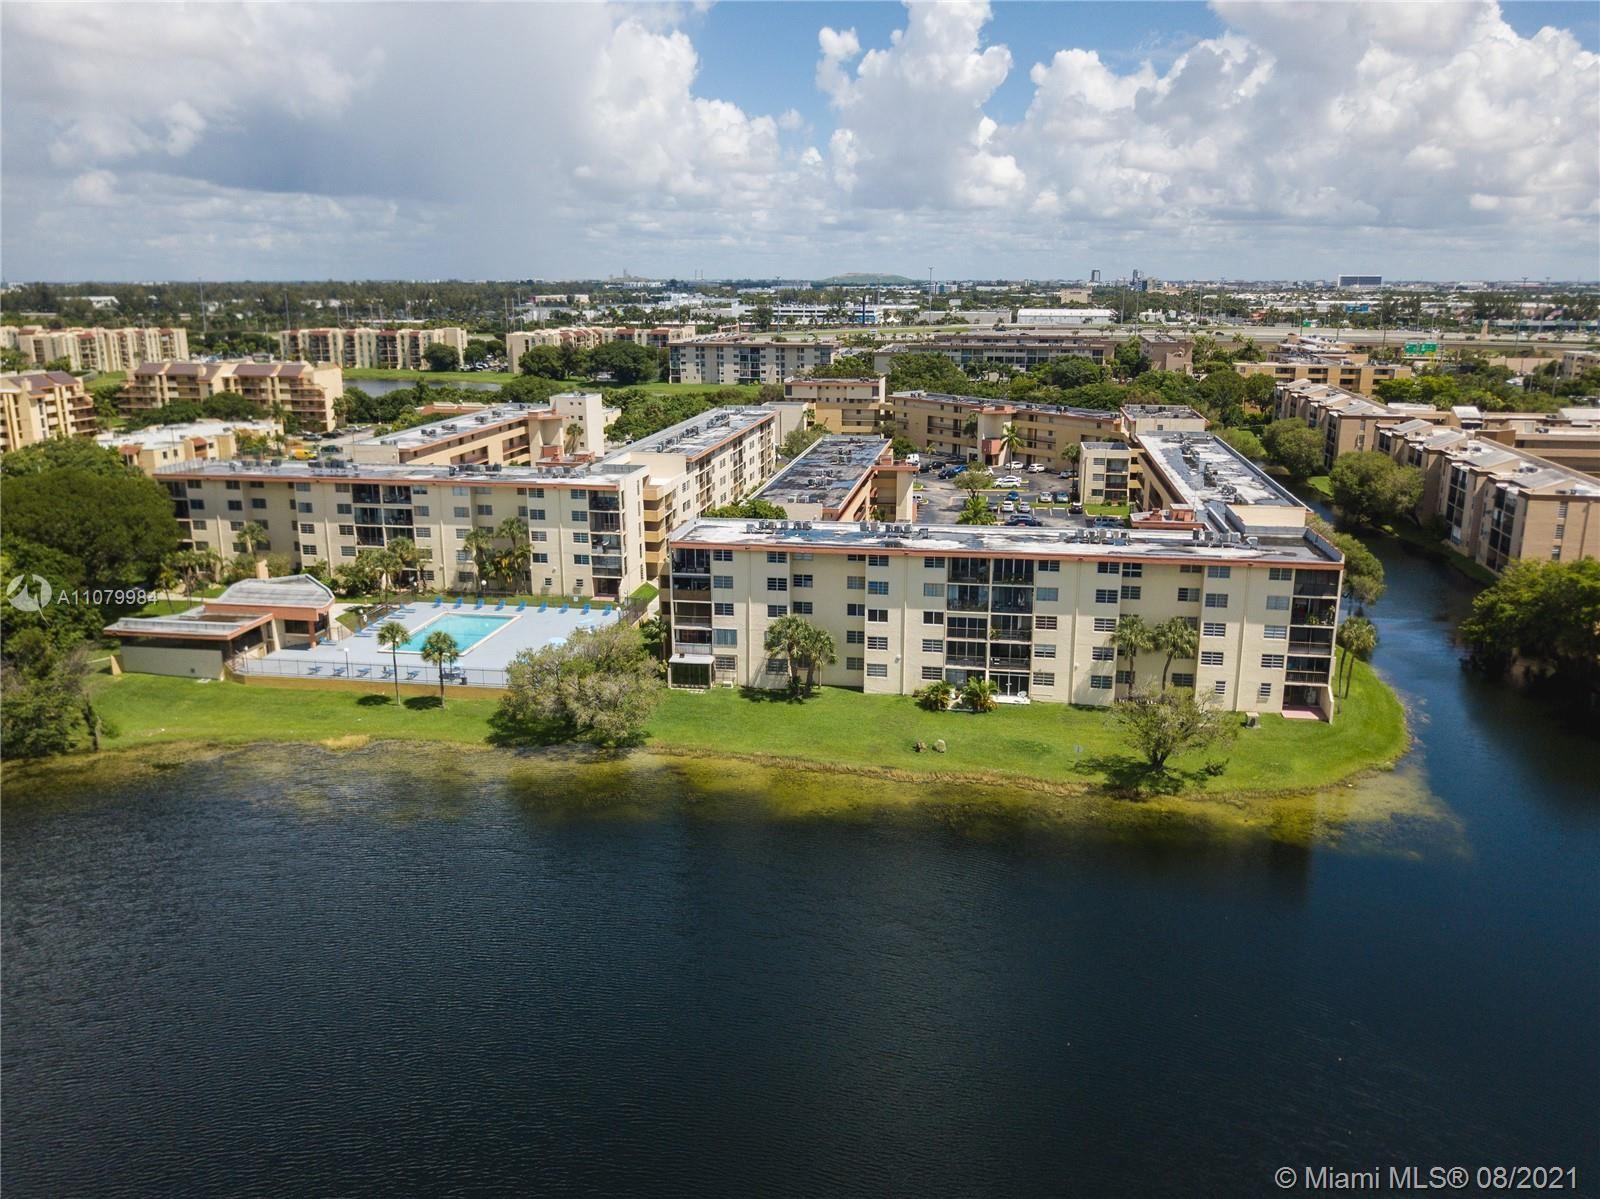 8895 Fontainebleau Blvd #110, Miami, FL 33172 - #: A11079984